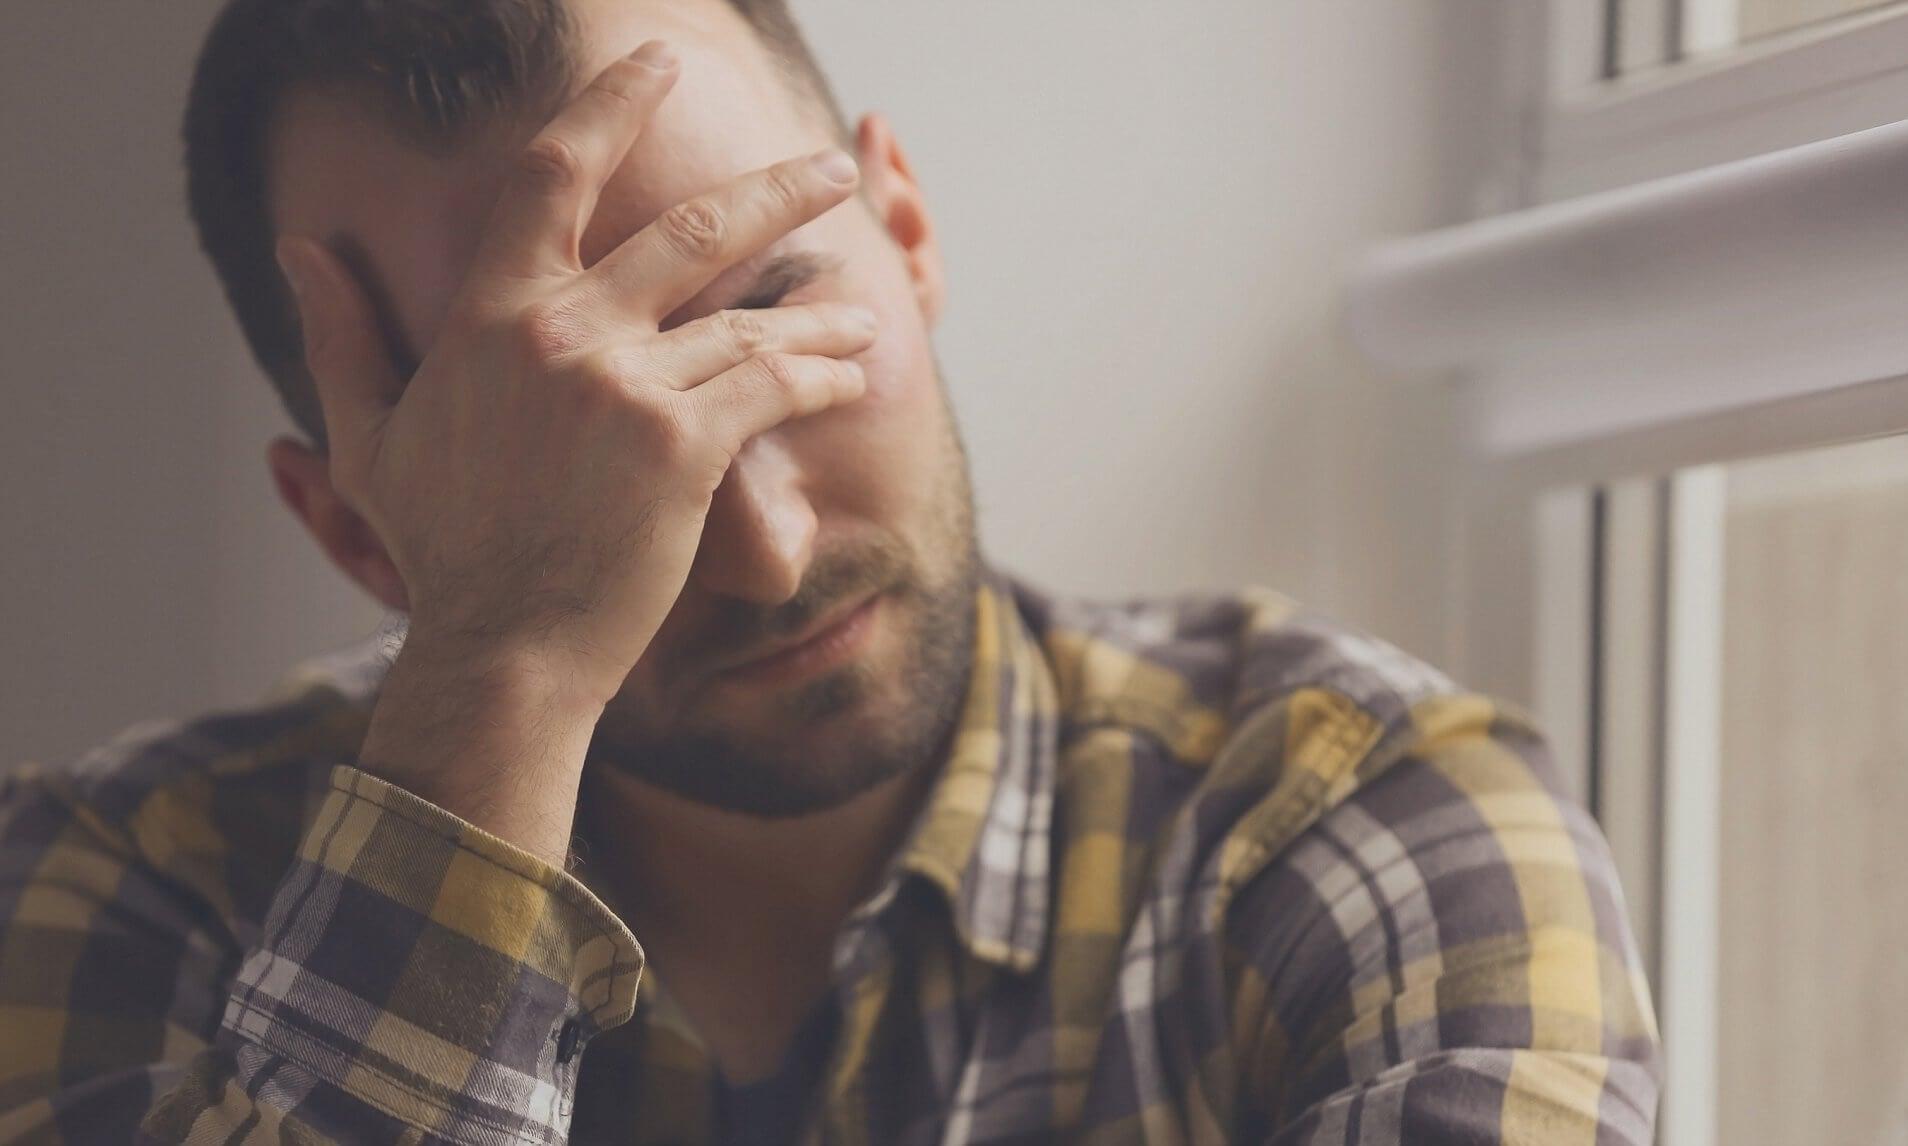 Hombre preocupado por sufrir manchas por estrés